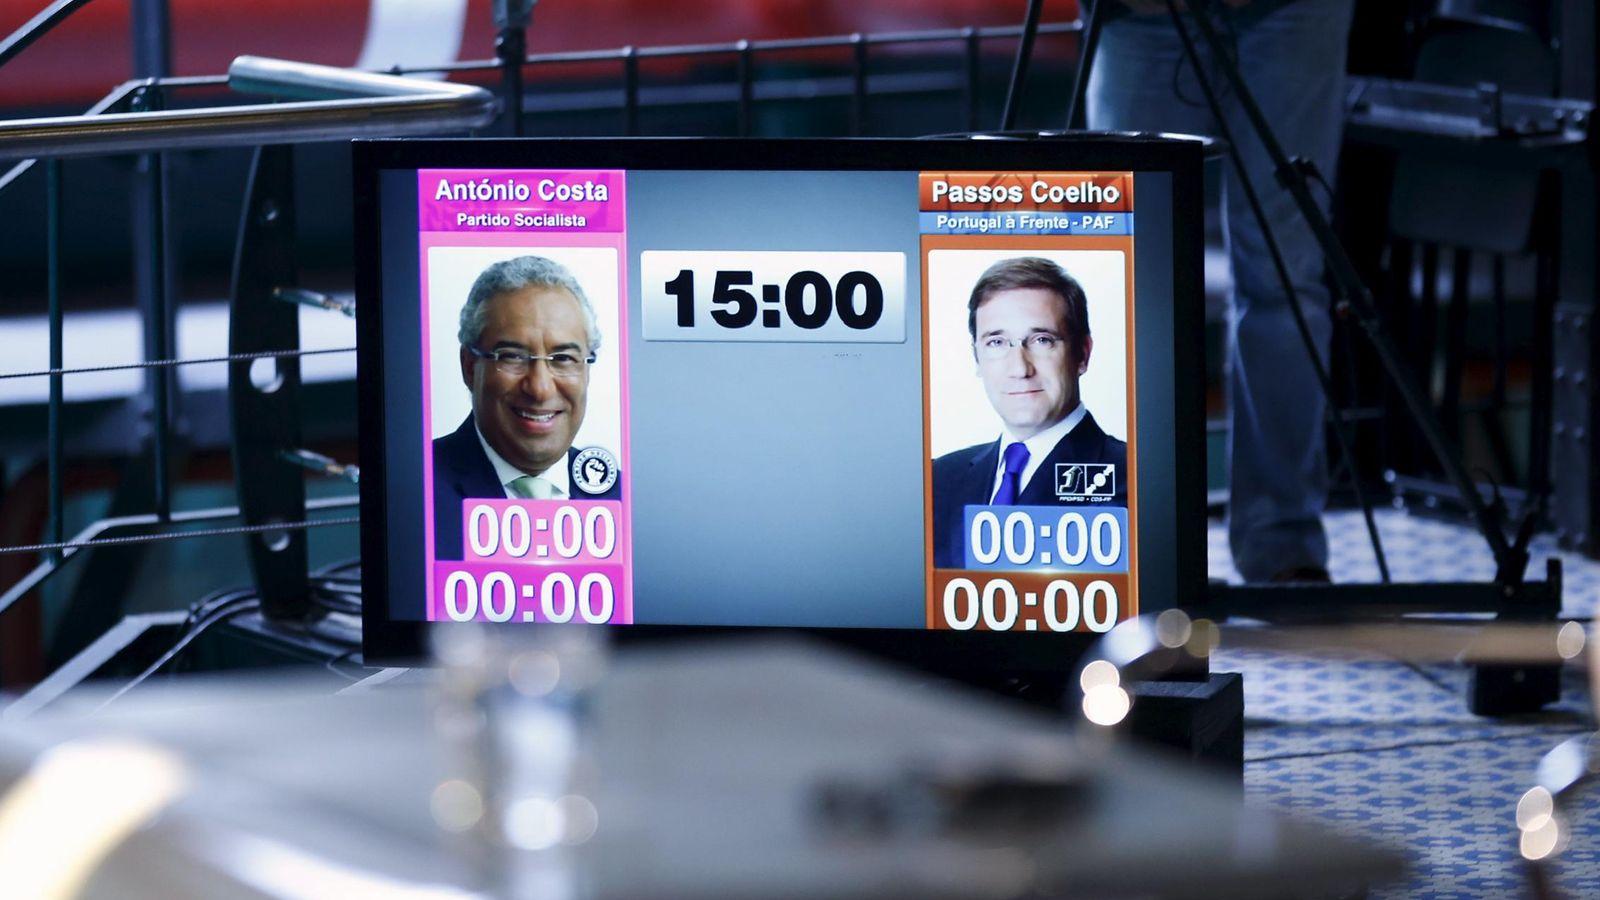 Amaral Desnuda portugal vota su futuro con la derecha camuflada y la